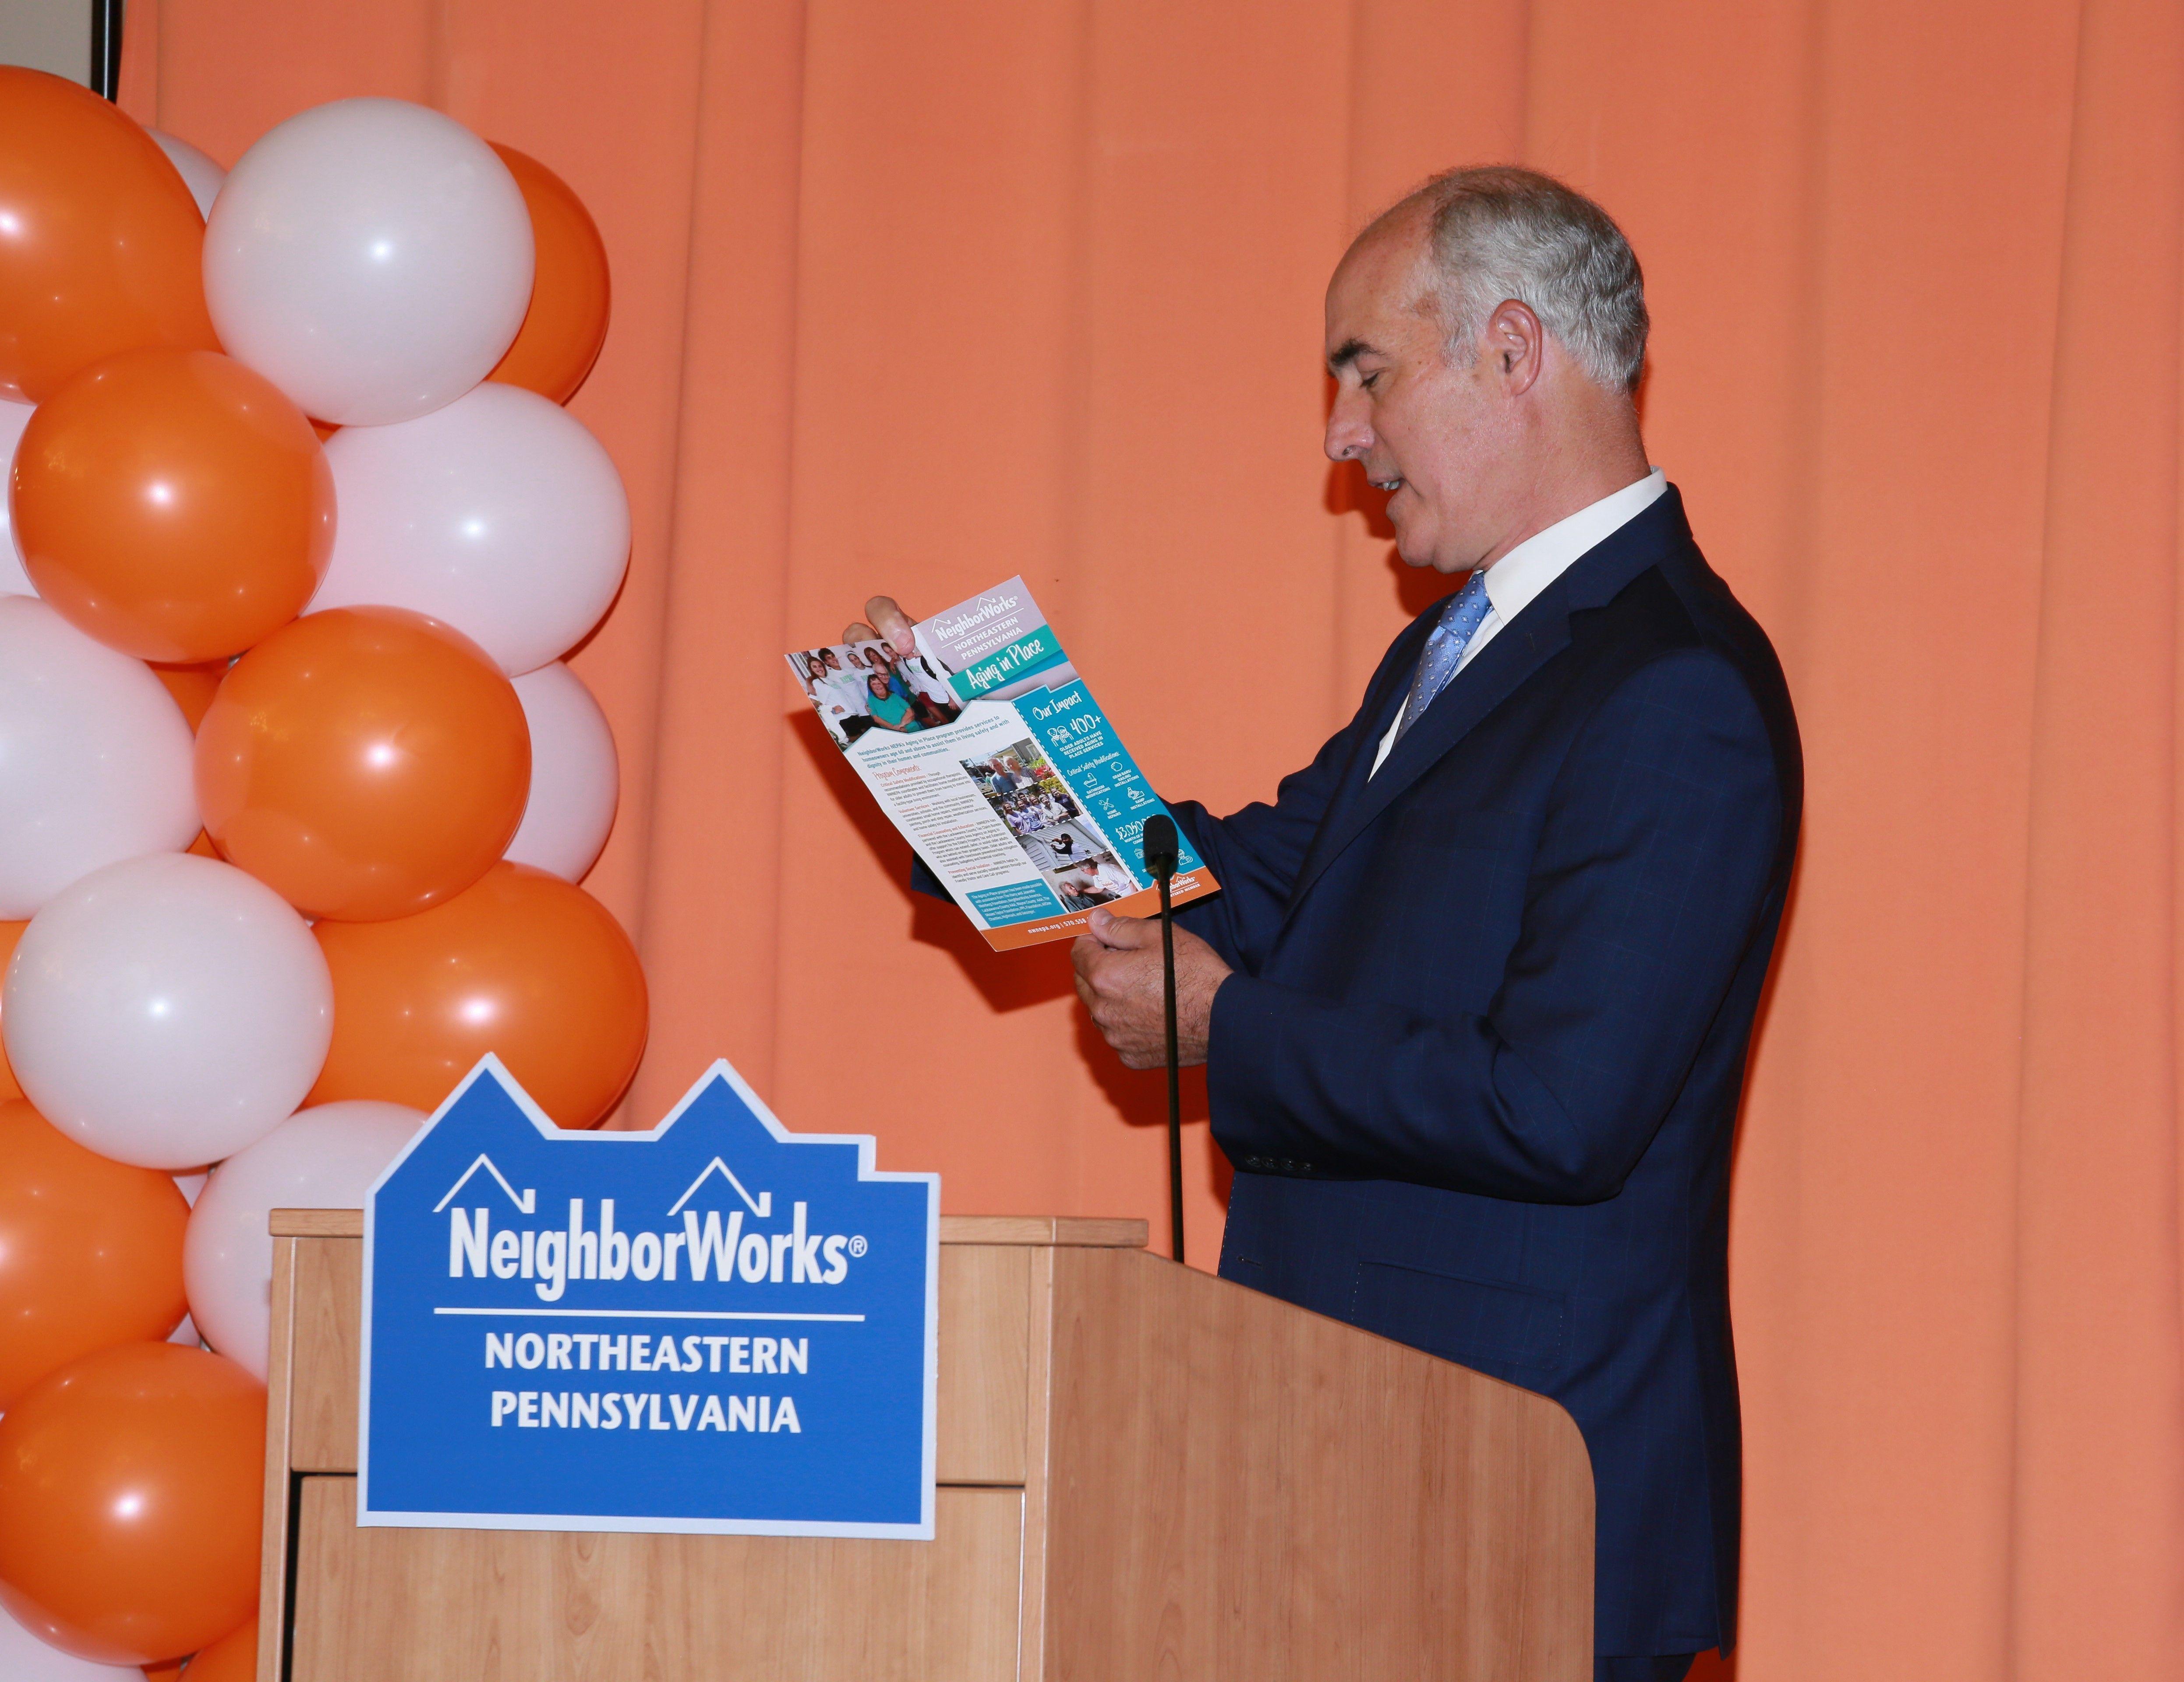 NeighborWorks NEPA, Senator Casey Announce $1  Million HUD Grant for Aging in Place Services